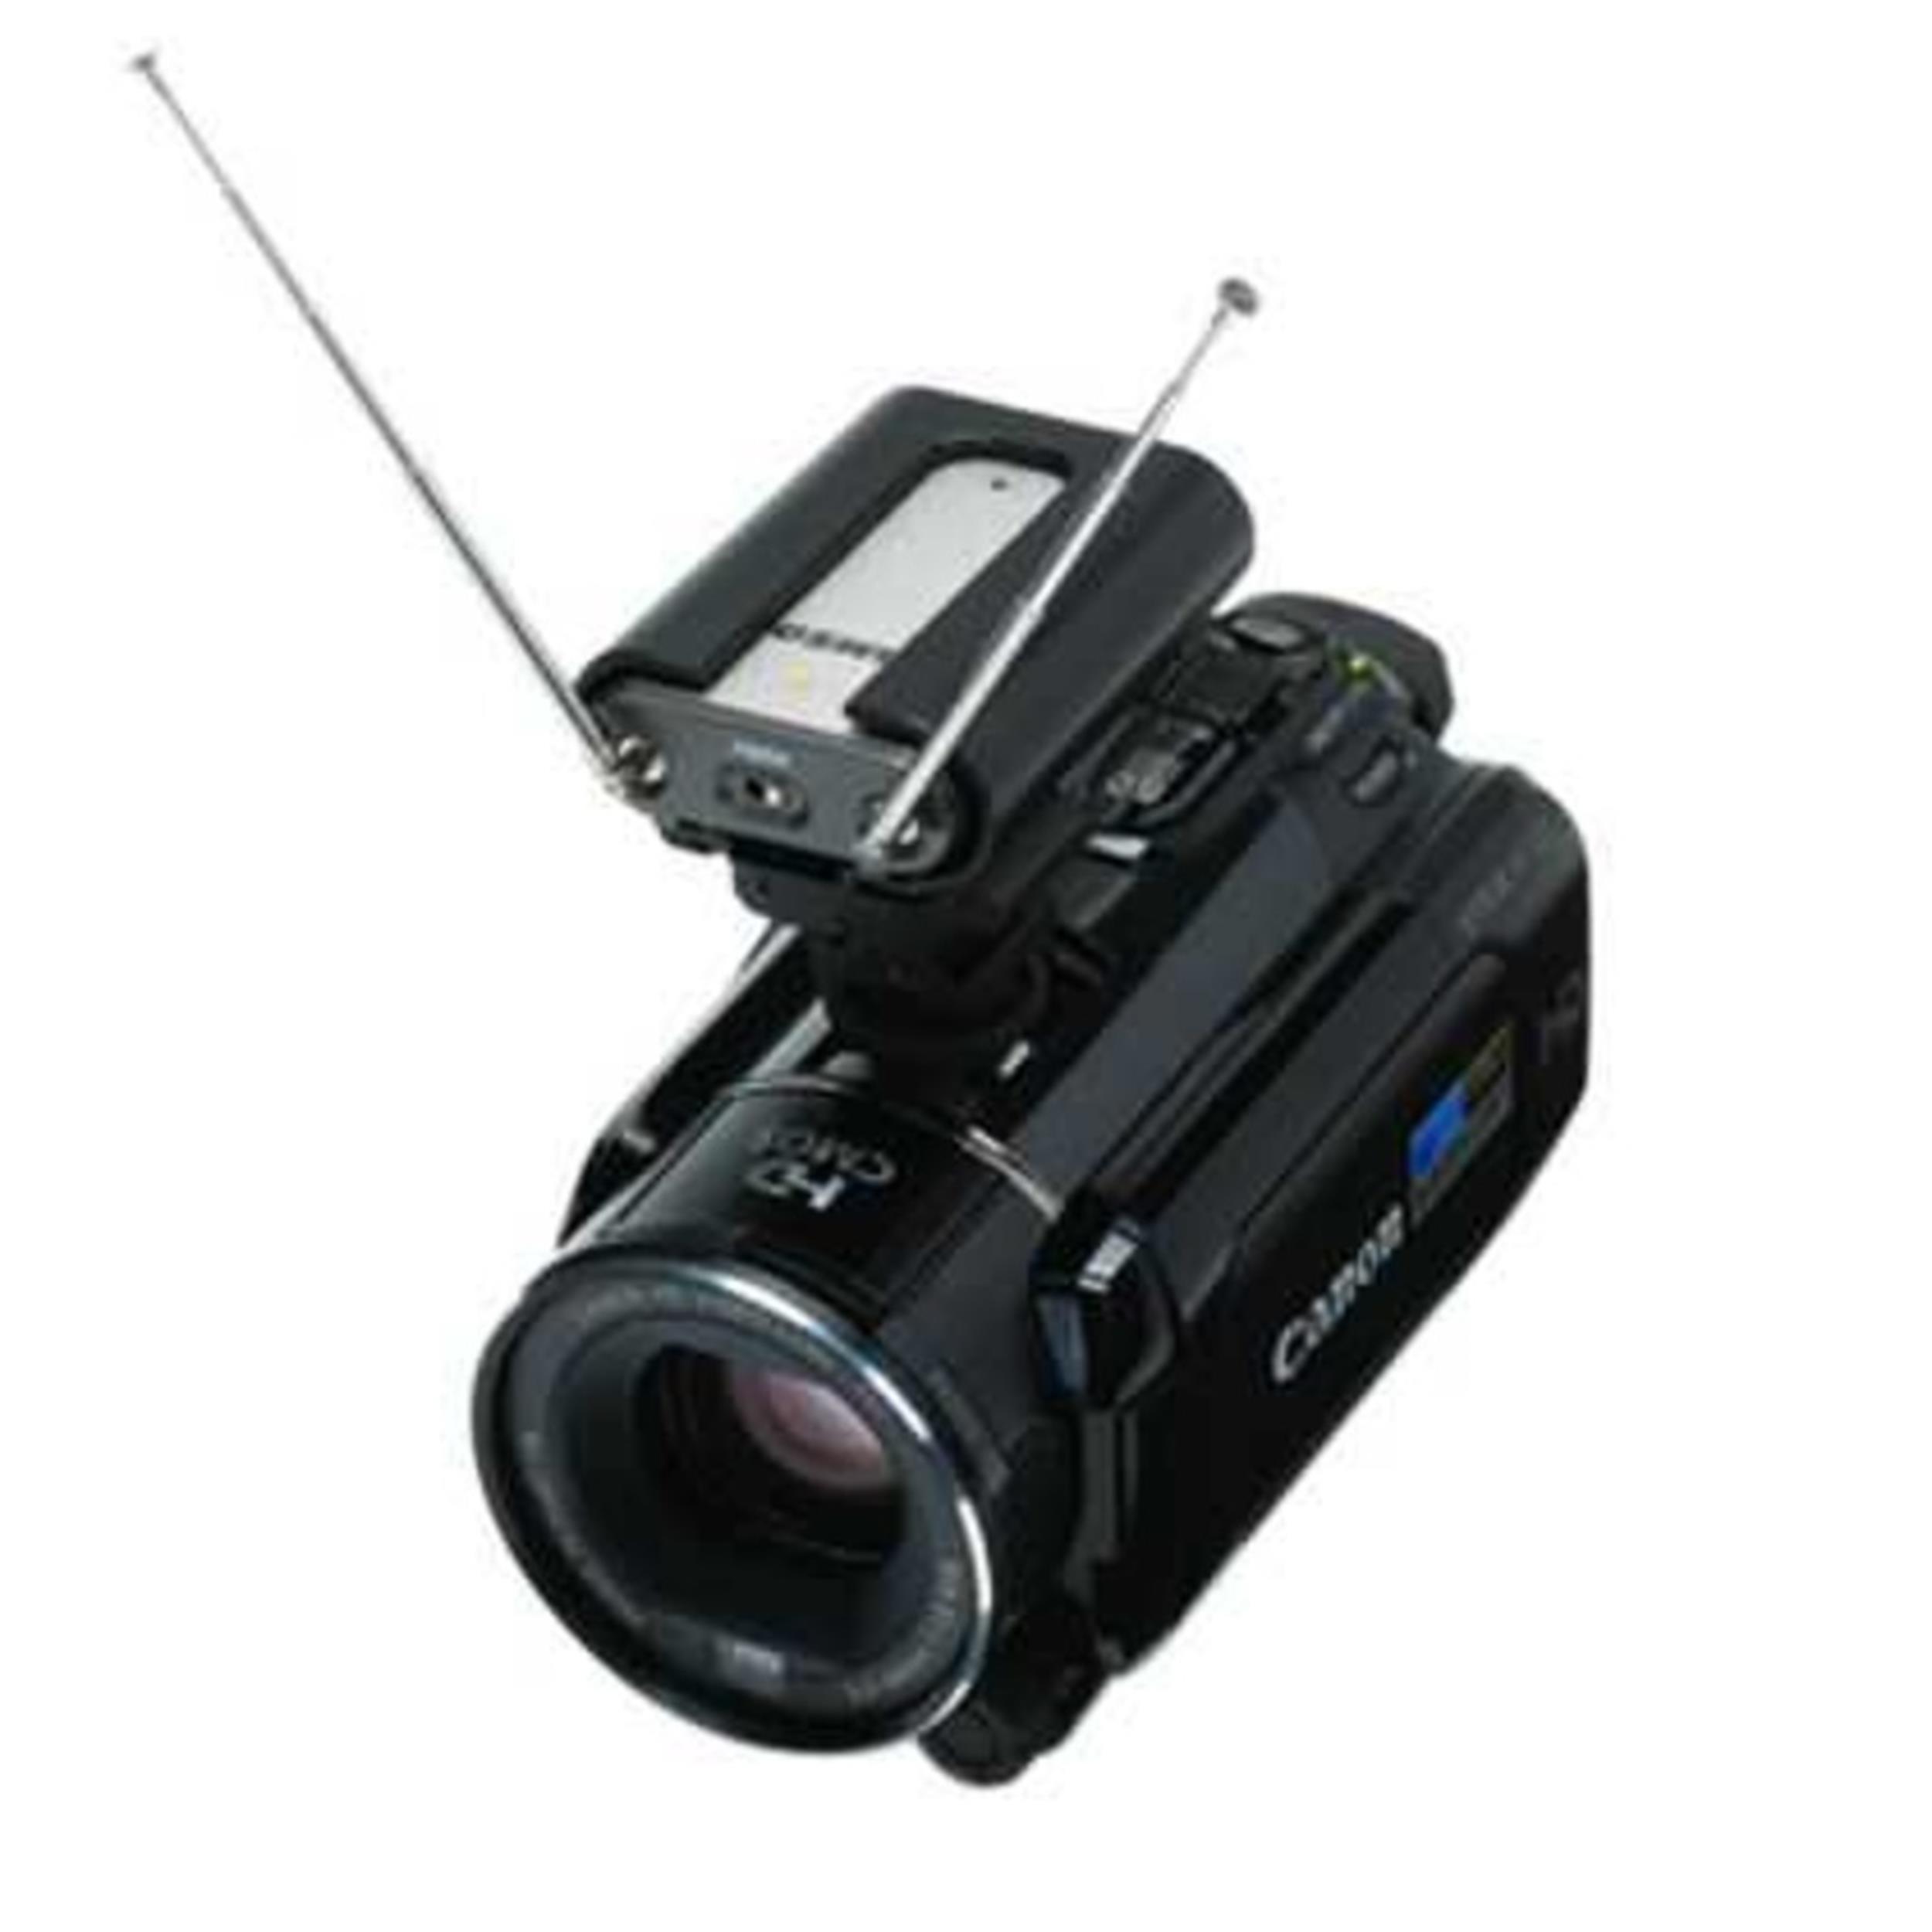 Samson-AIRLINE-MICRO-Camera-System-E2-863-625-MHz-sku-7649290647006